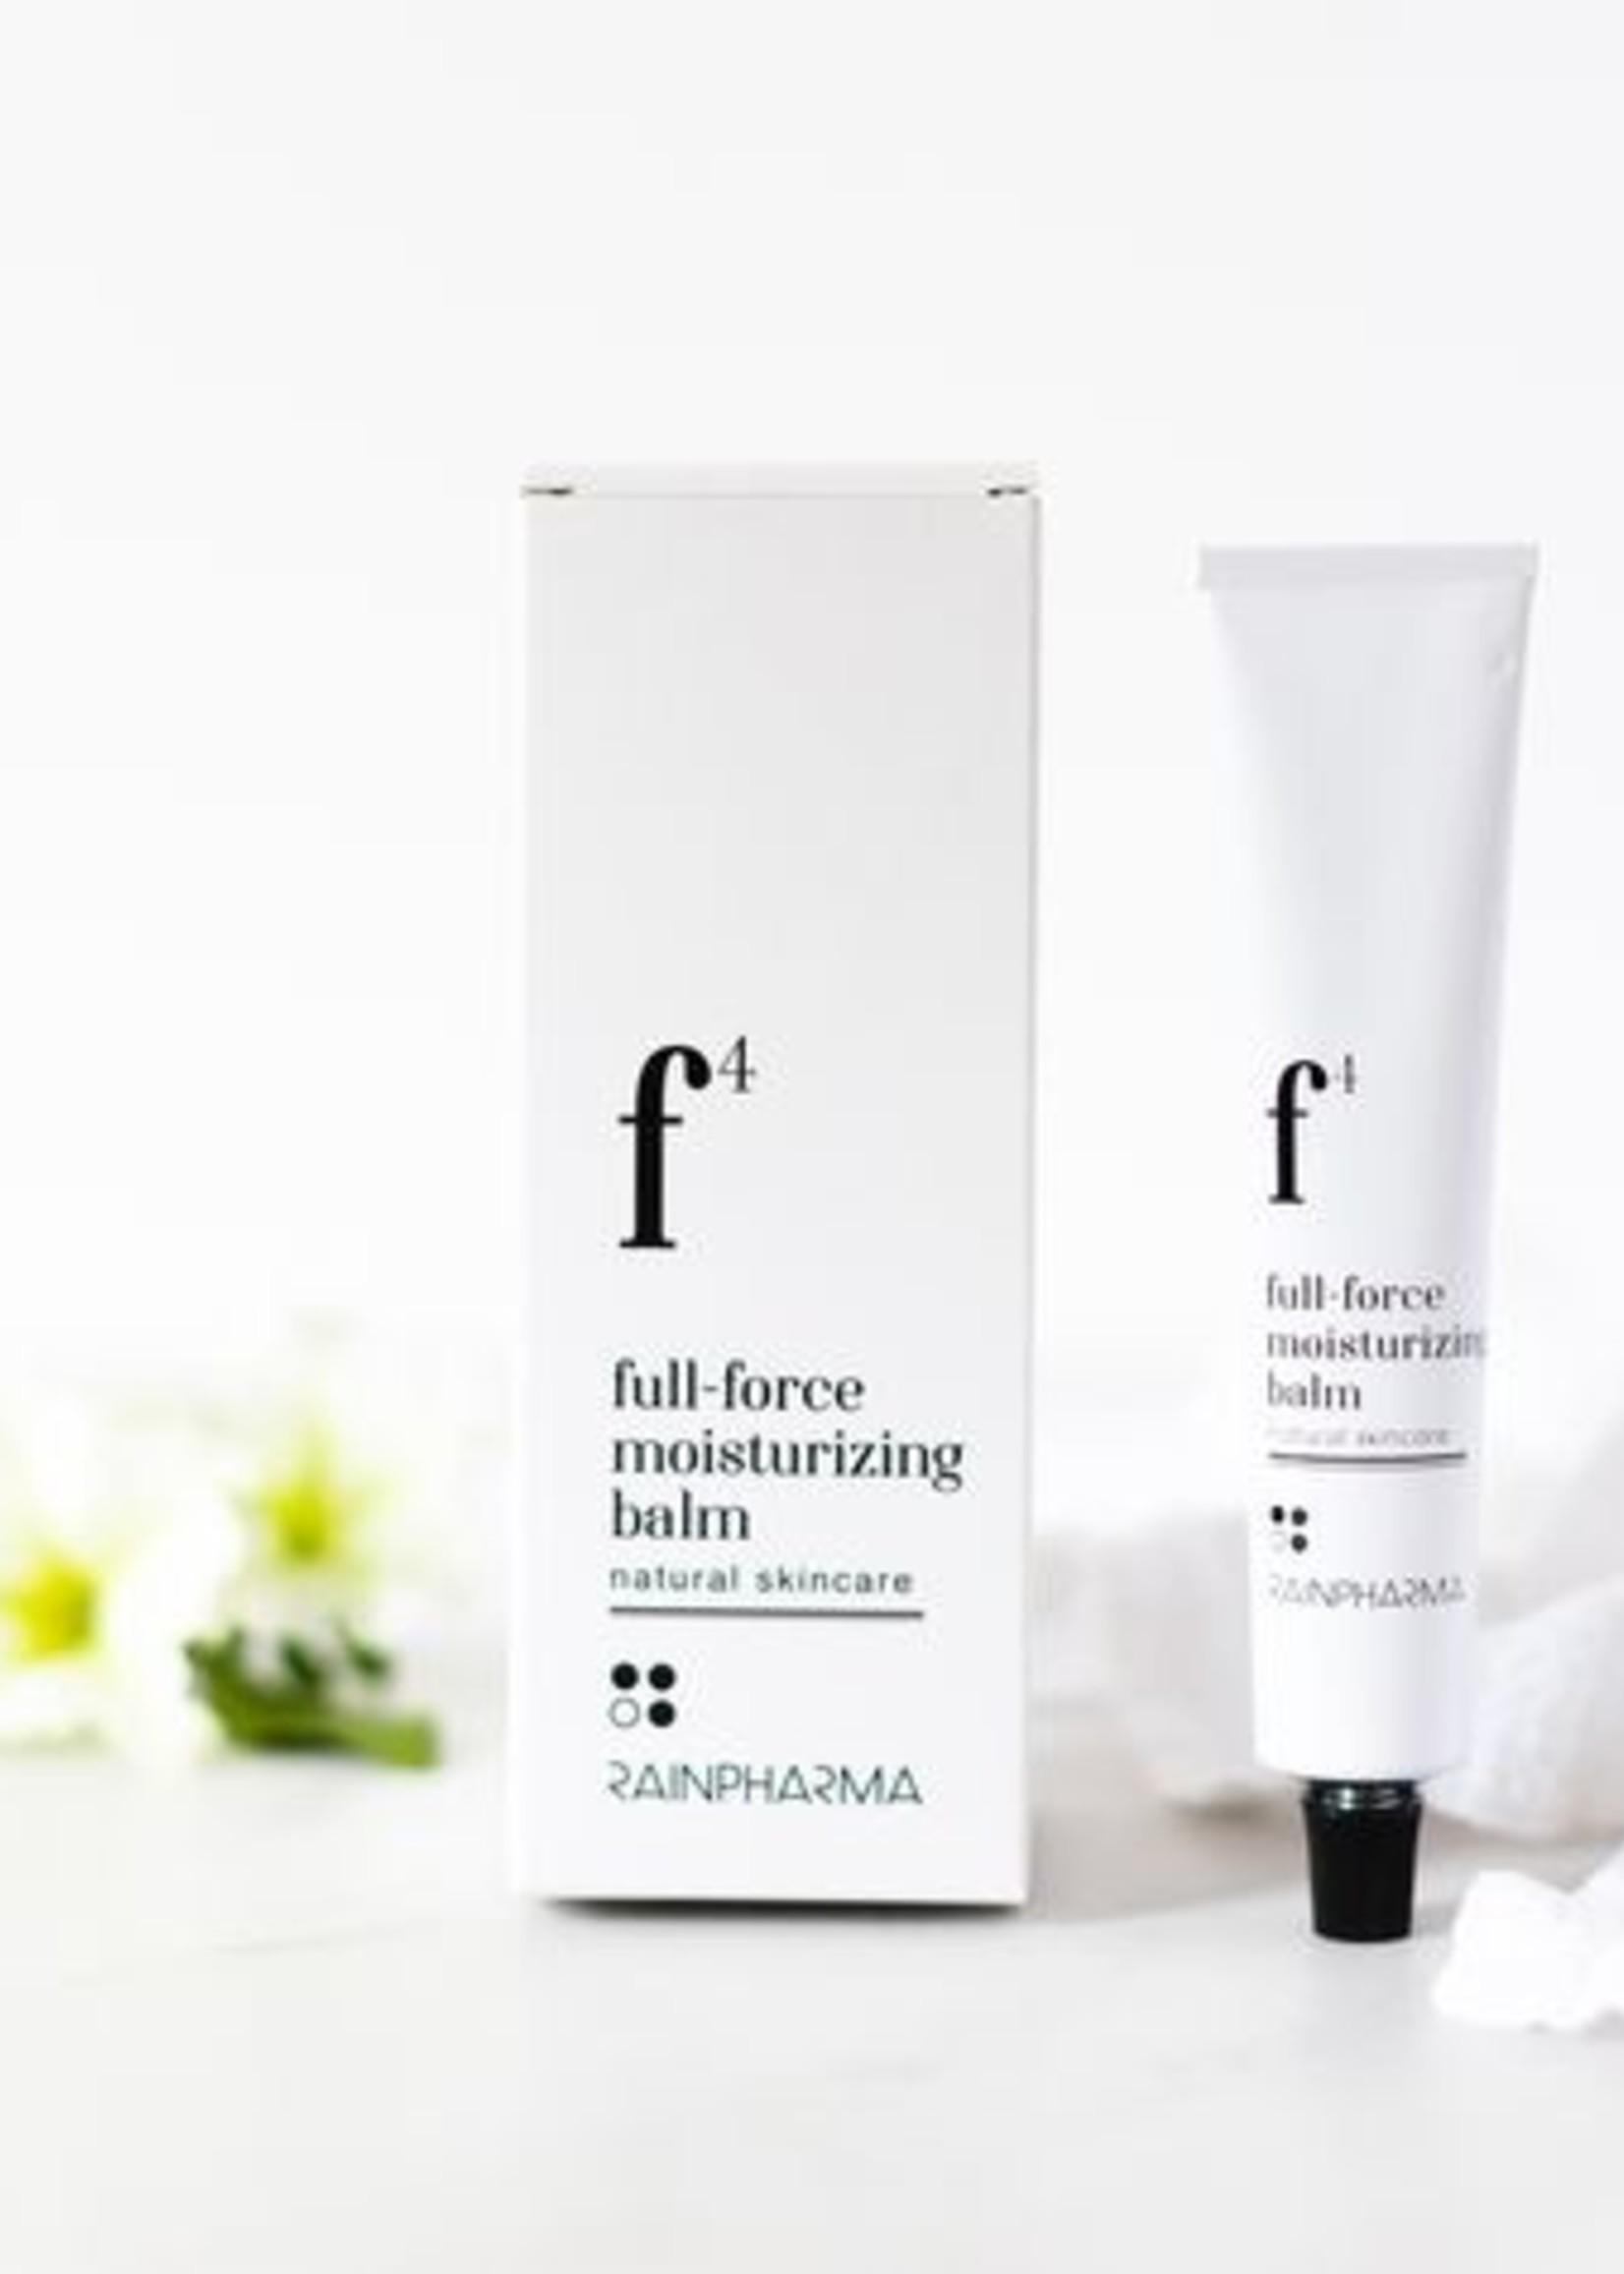 Rainpharma F4 - Full-Force Moisturizing Balm